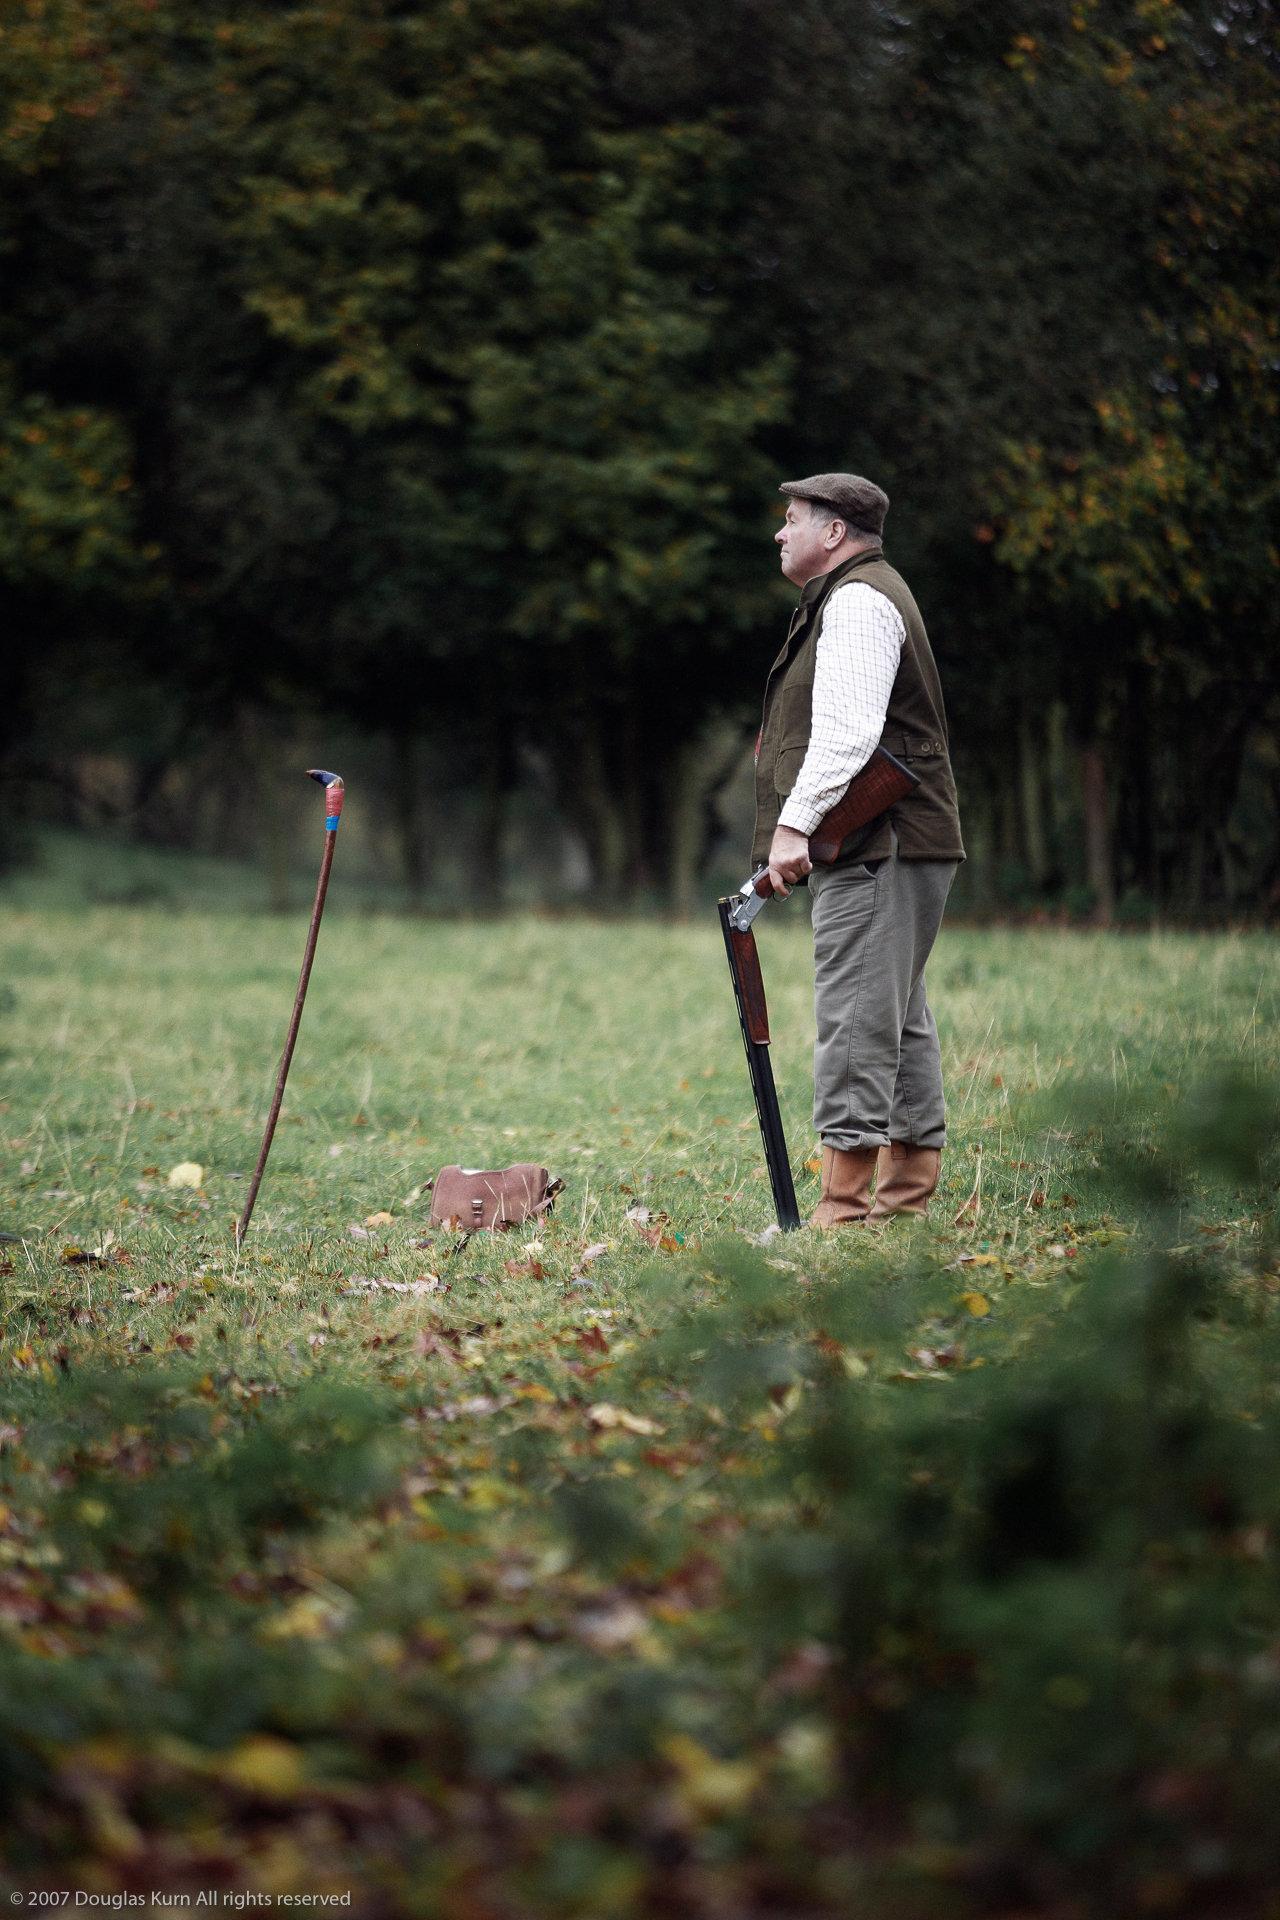 Nant Clwyd Shoot November 2005